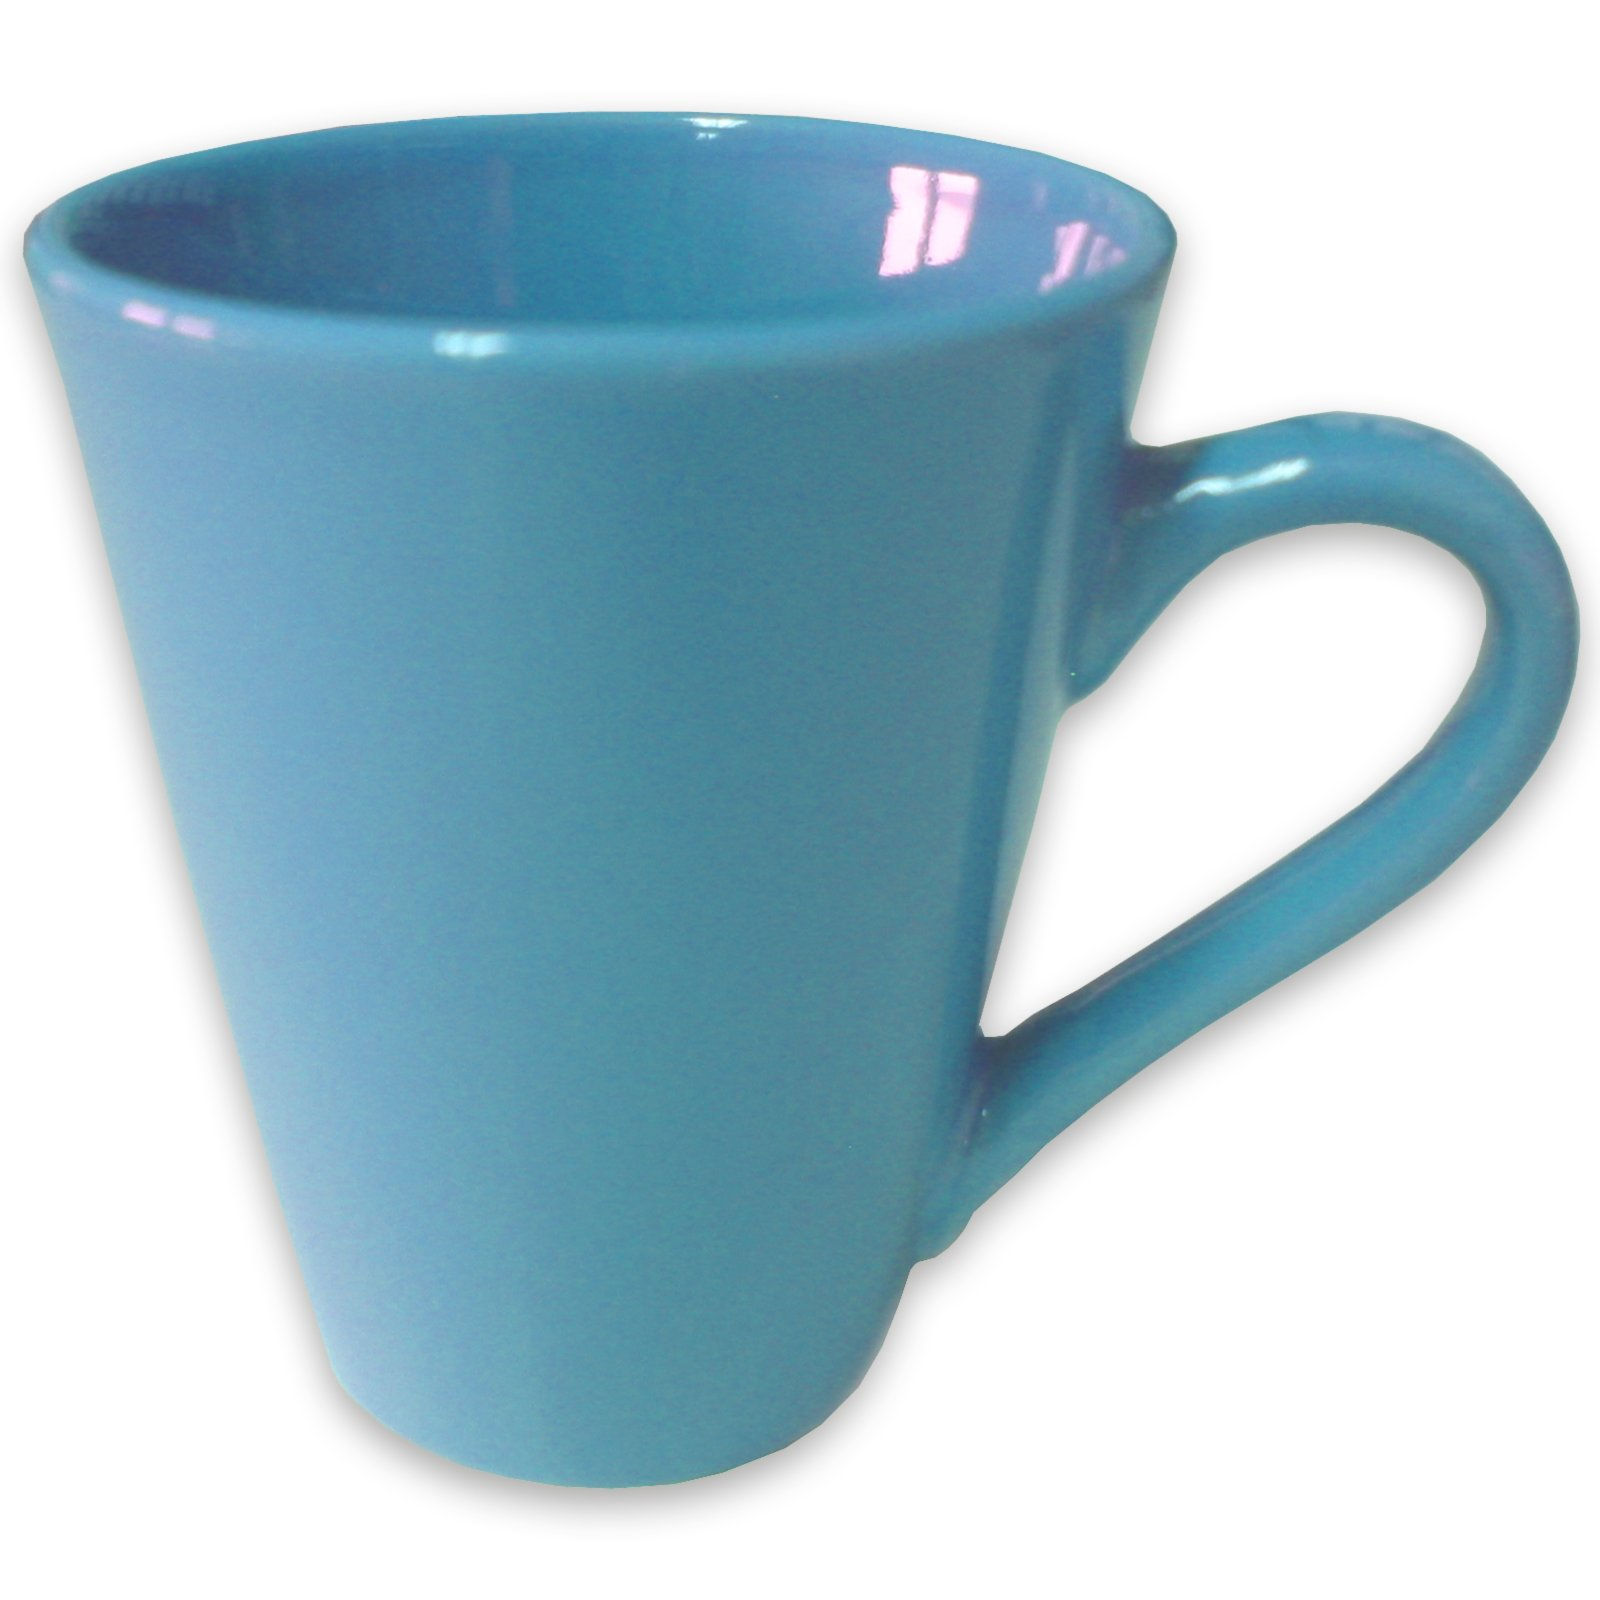 Tasse - türkis - Keramik - 280 ml